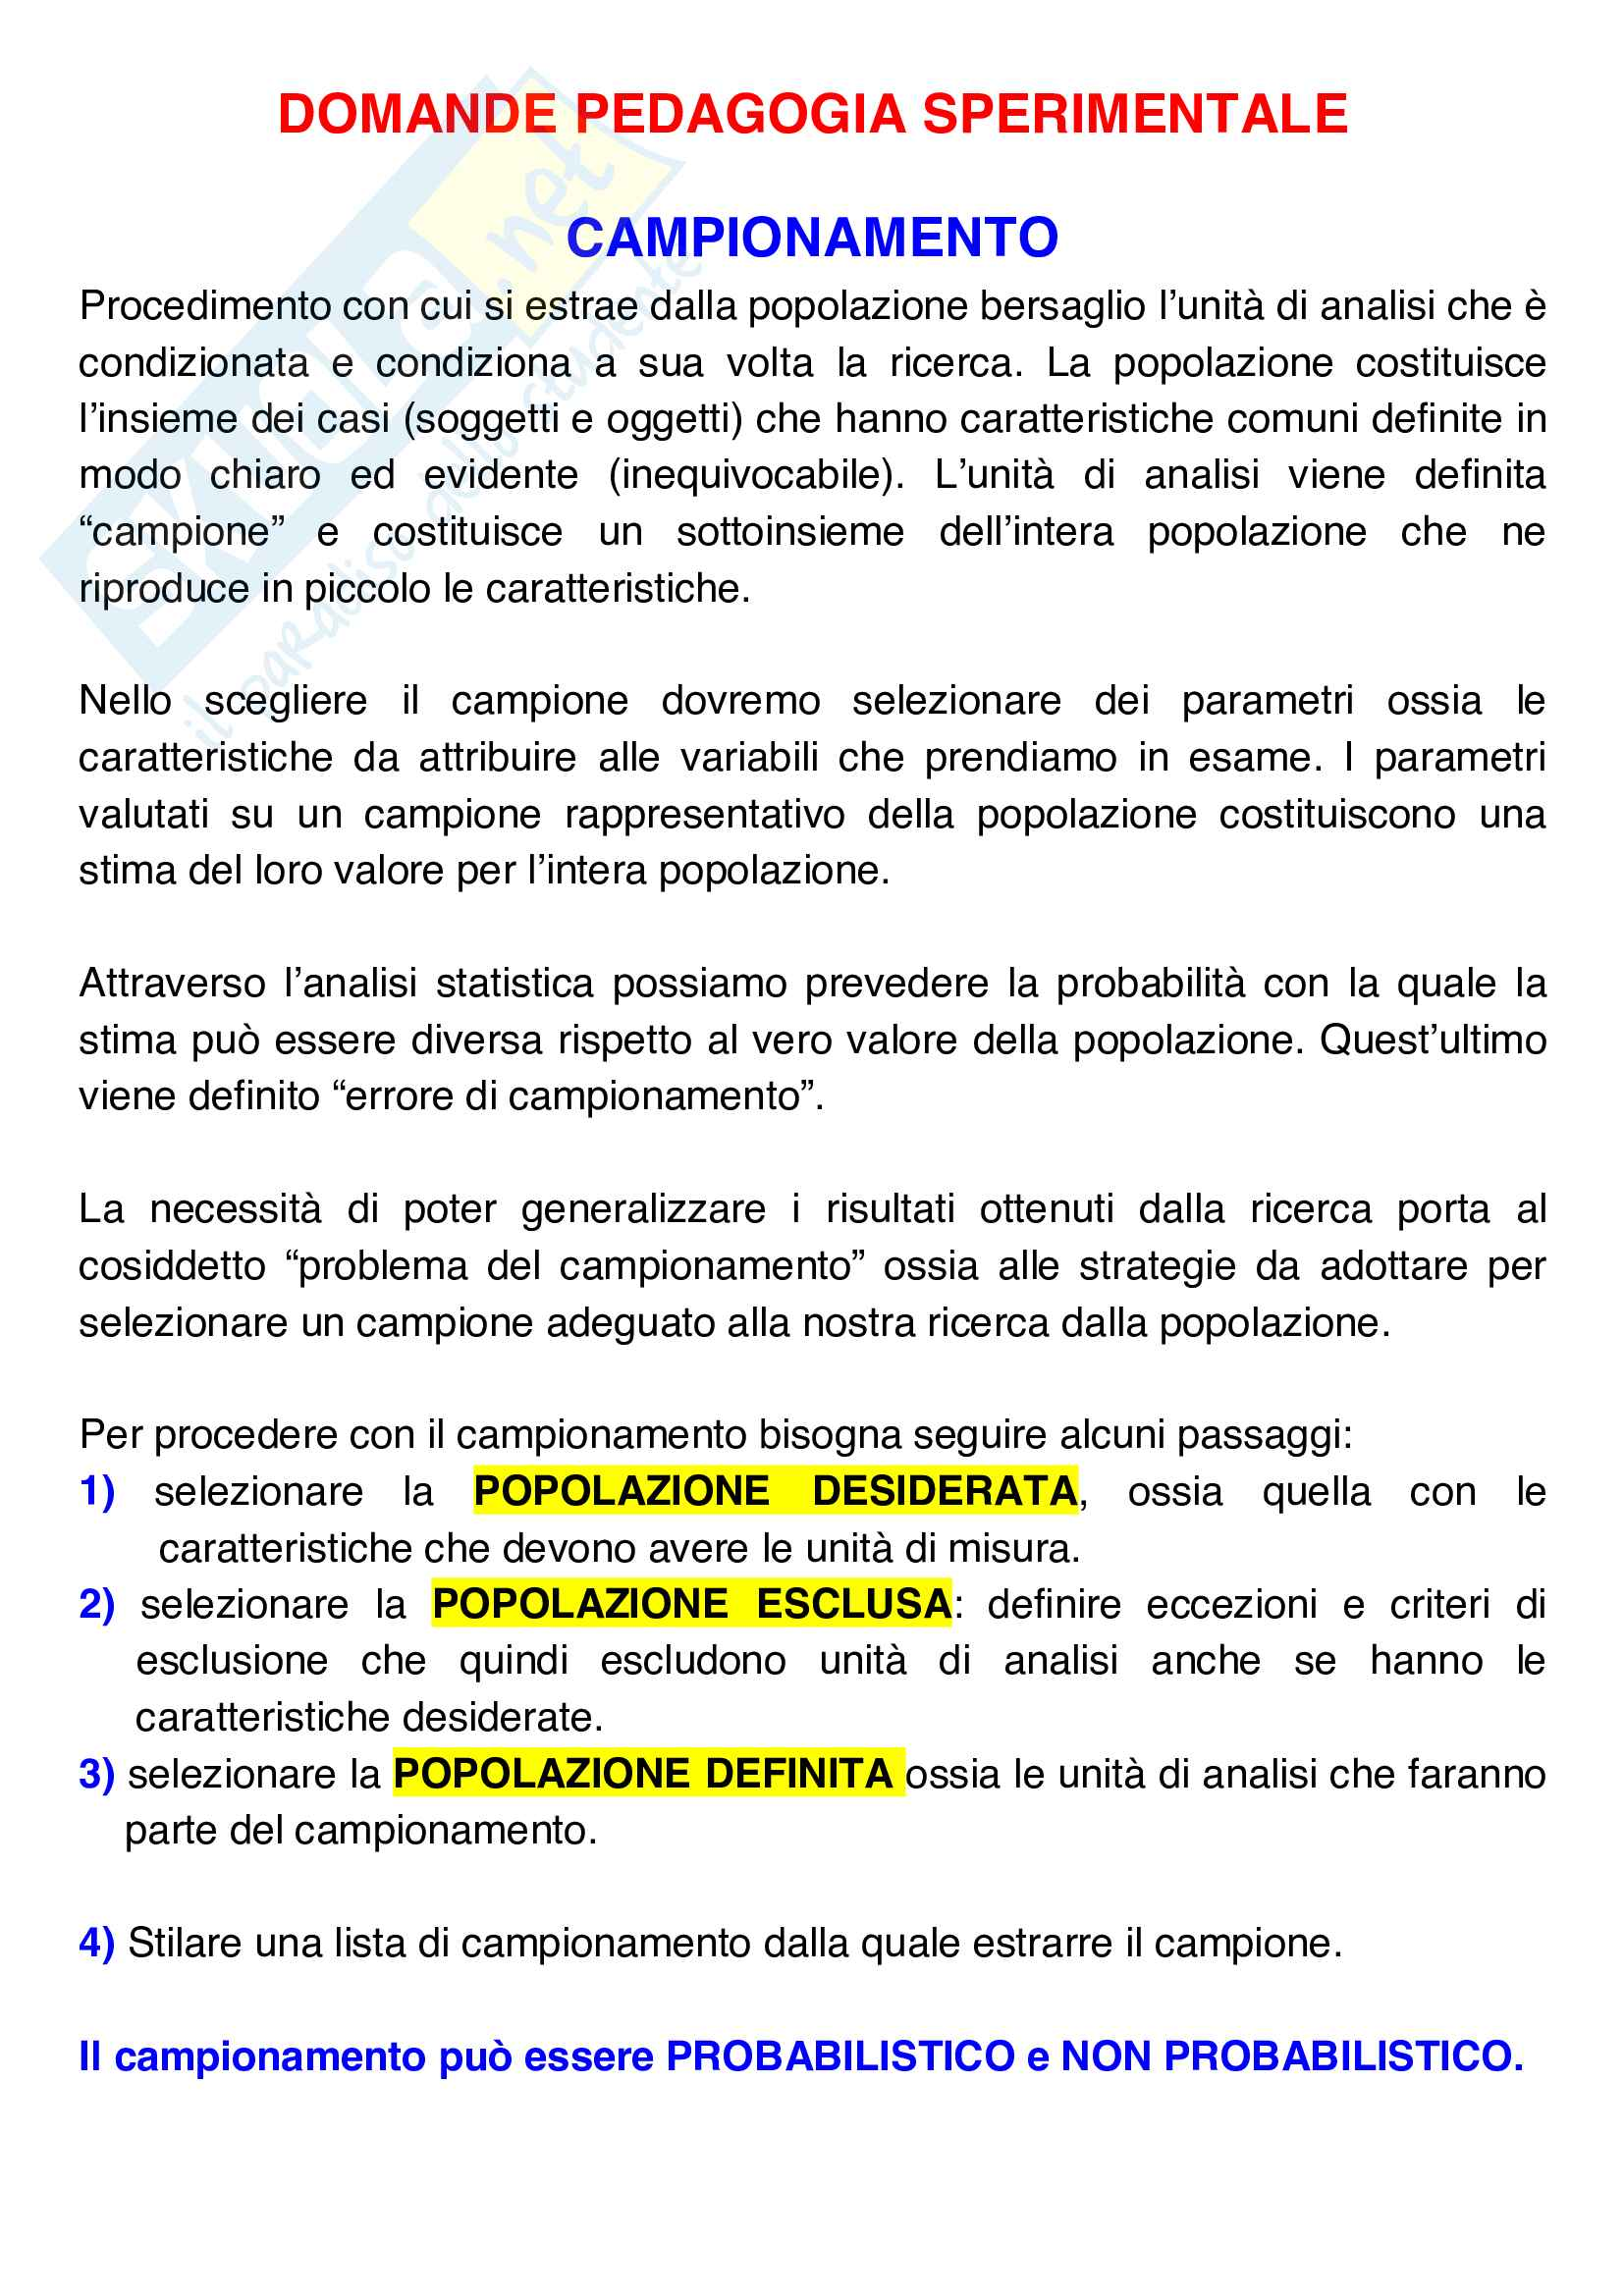 Riassunti dettagliati Esame Pedagogia sperimentale di Rossella D'Ugo Pag. 1